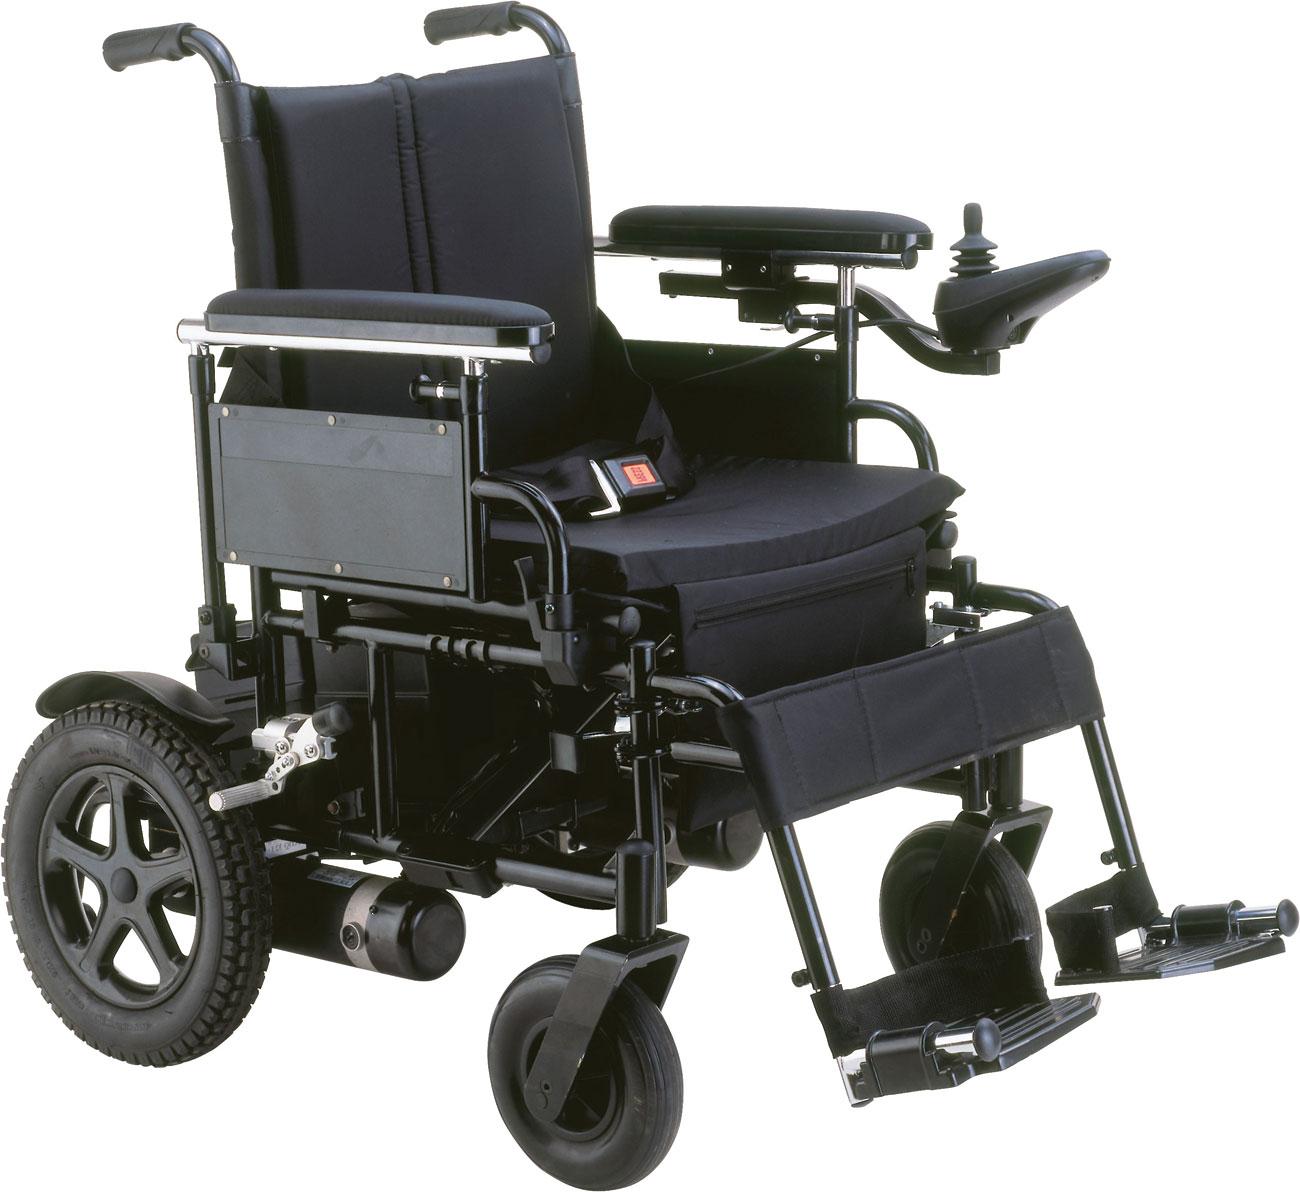 Cirrus Plus EC Folding Rear-Wheel Drive Power Wheelchair